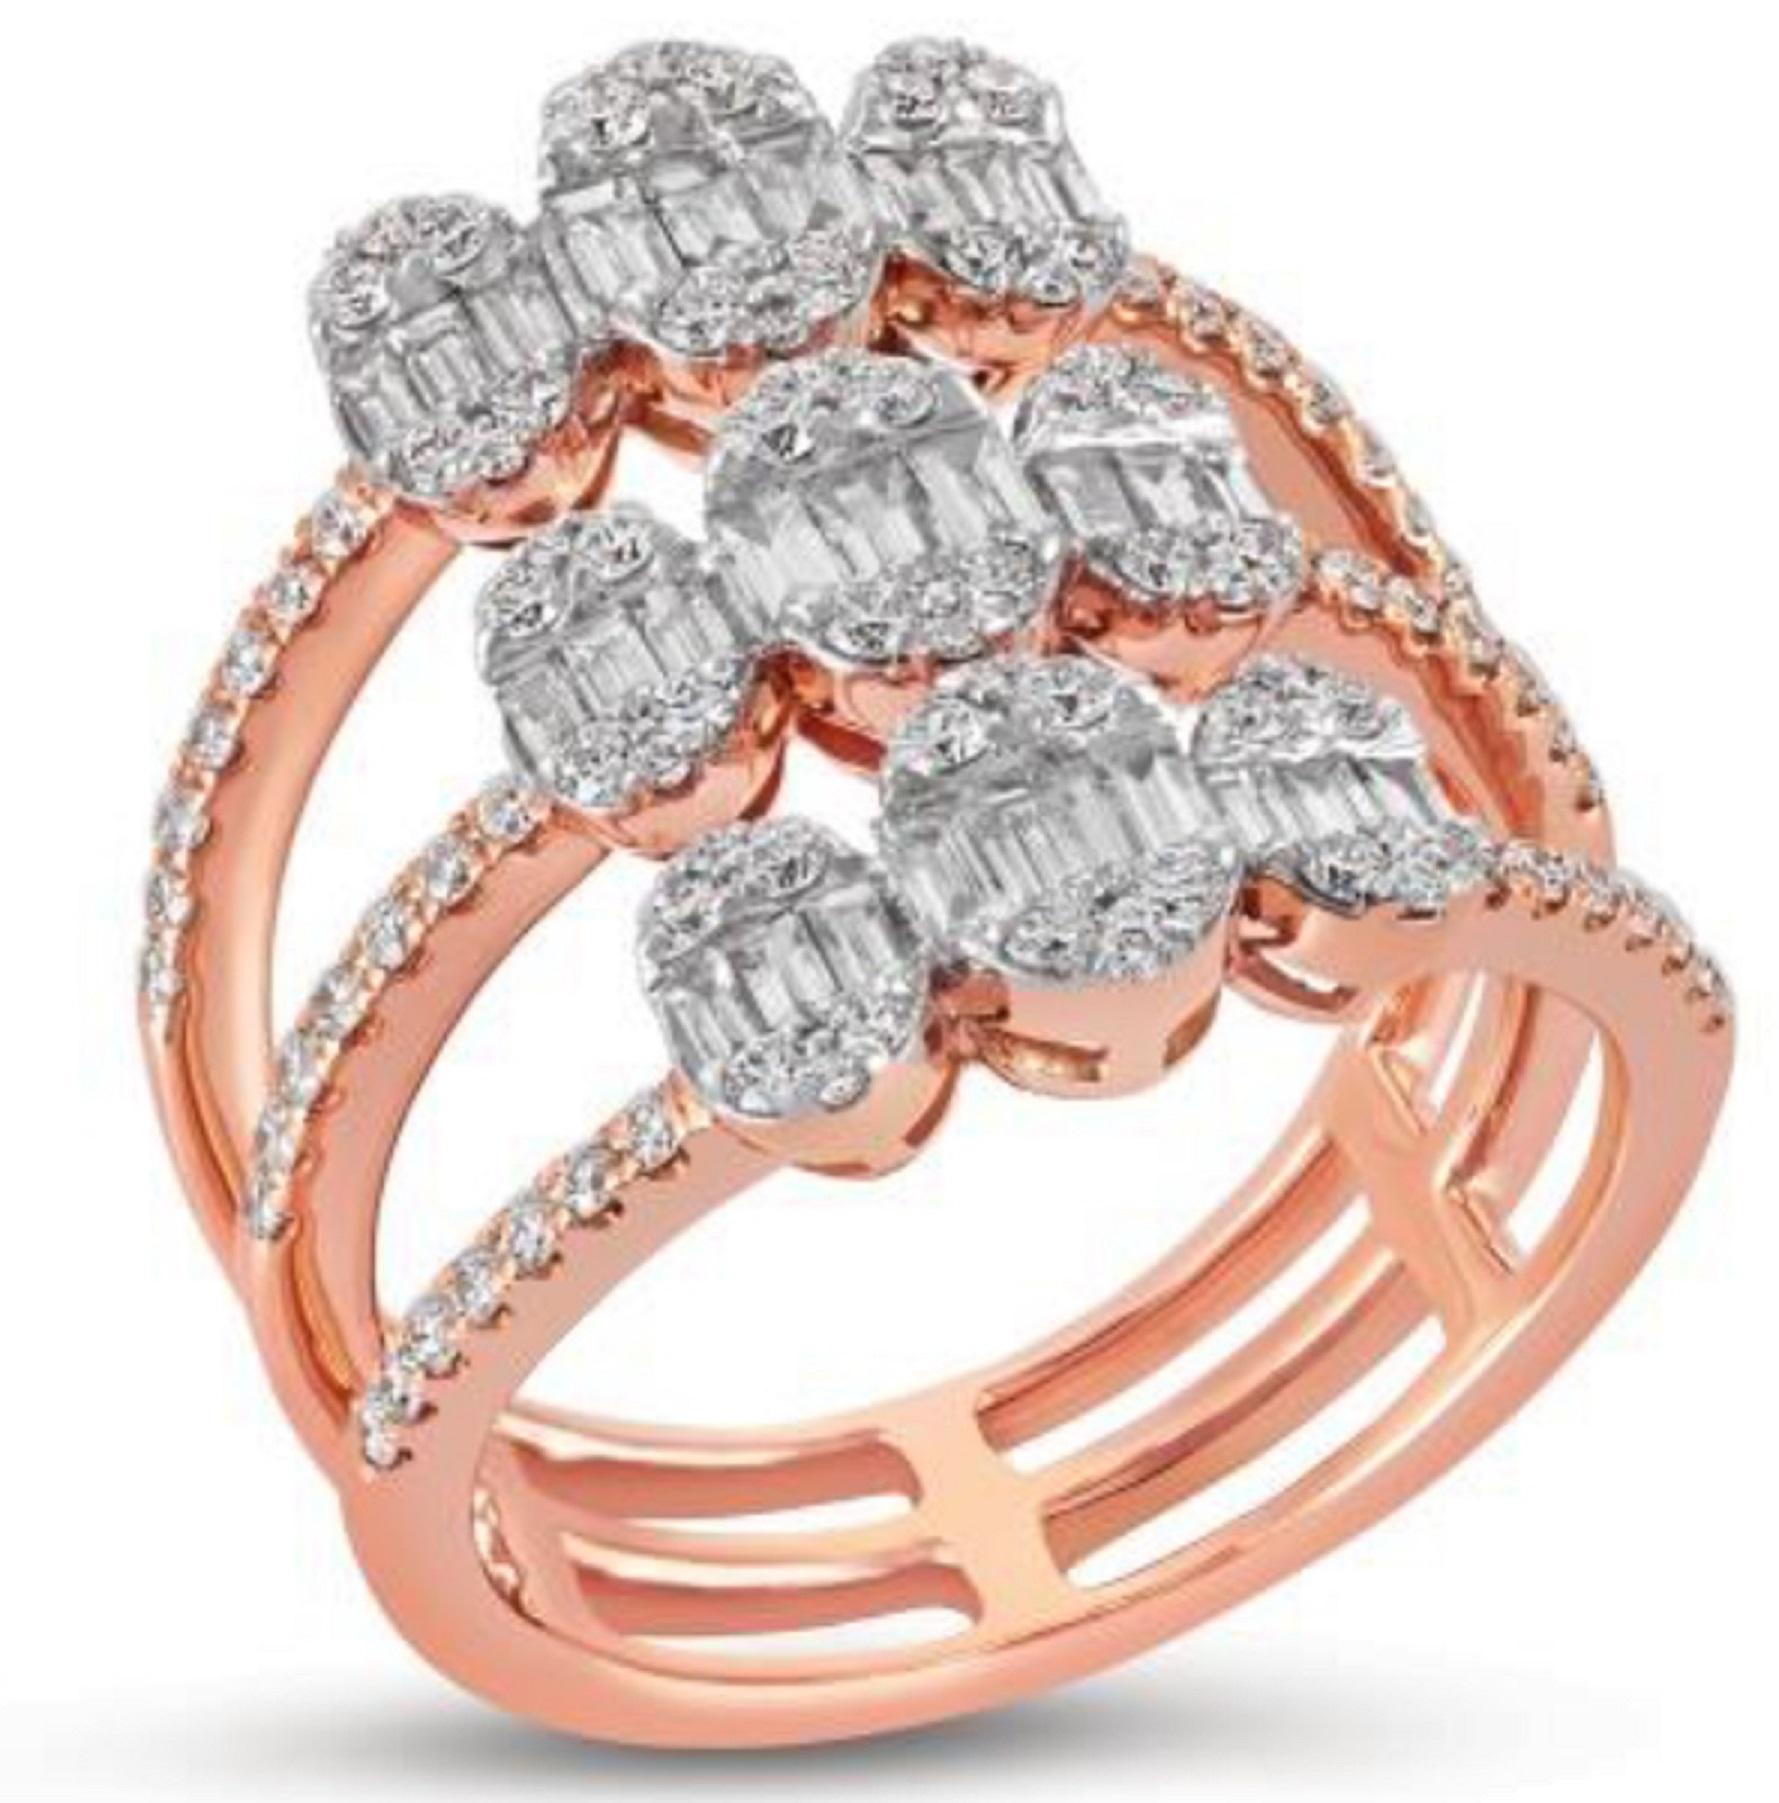 8fc0c844870e1 Diamonds That Make You A 'Star'! - The Jewellery Diaries